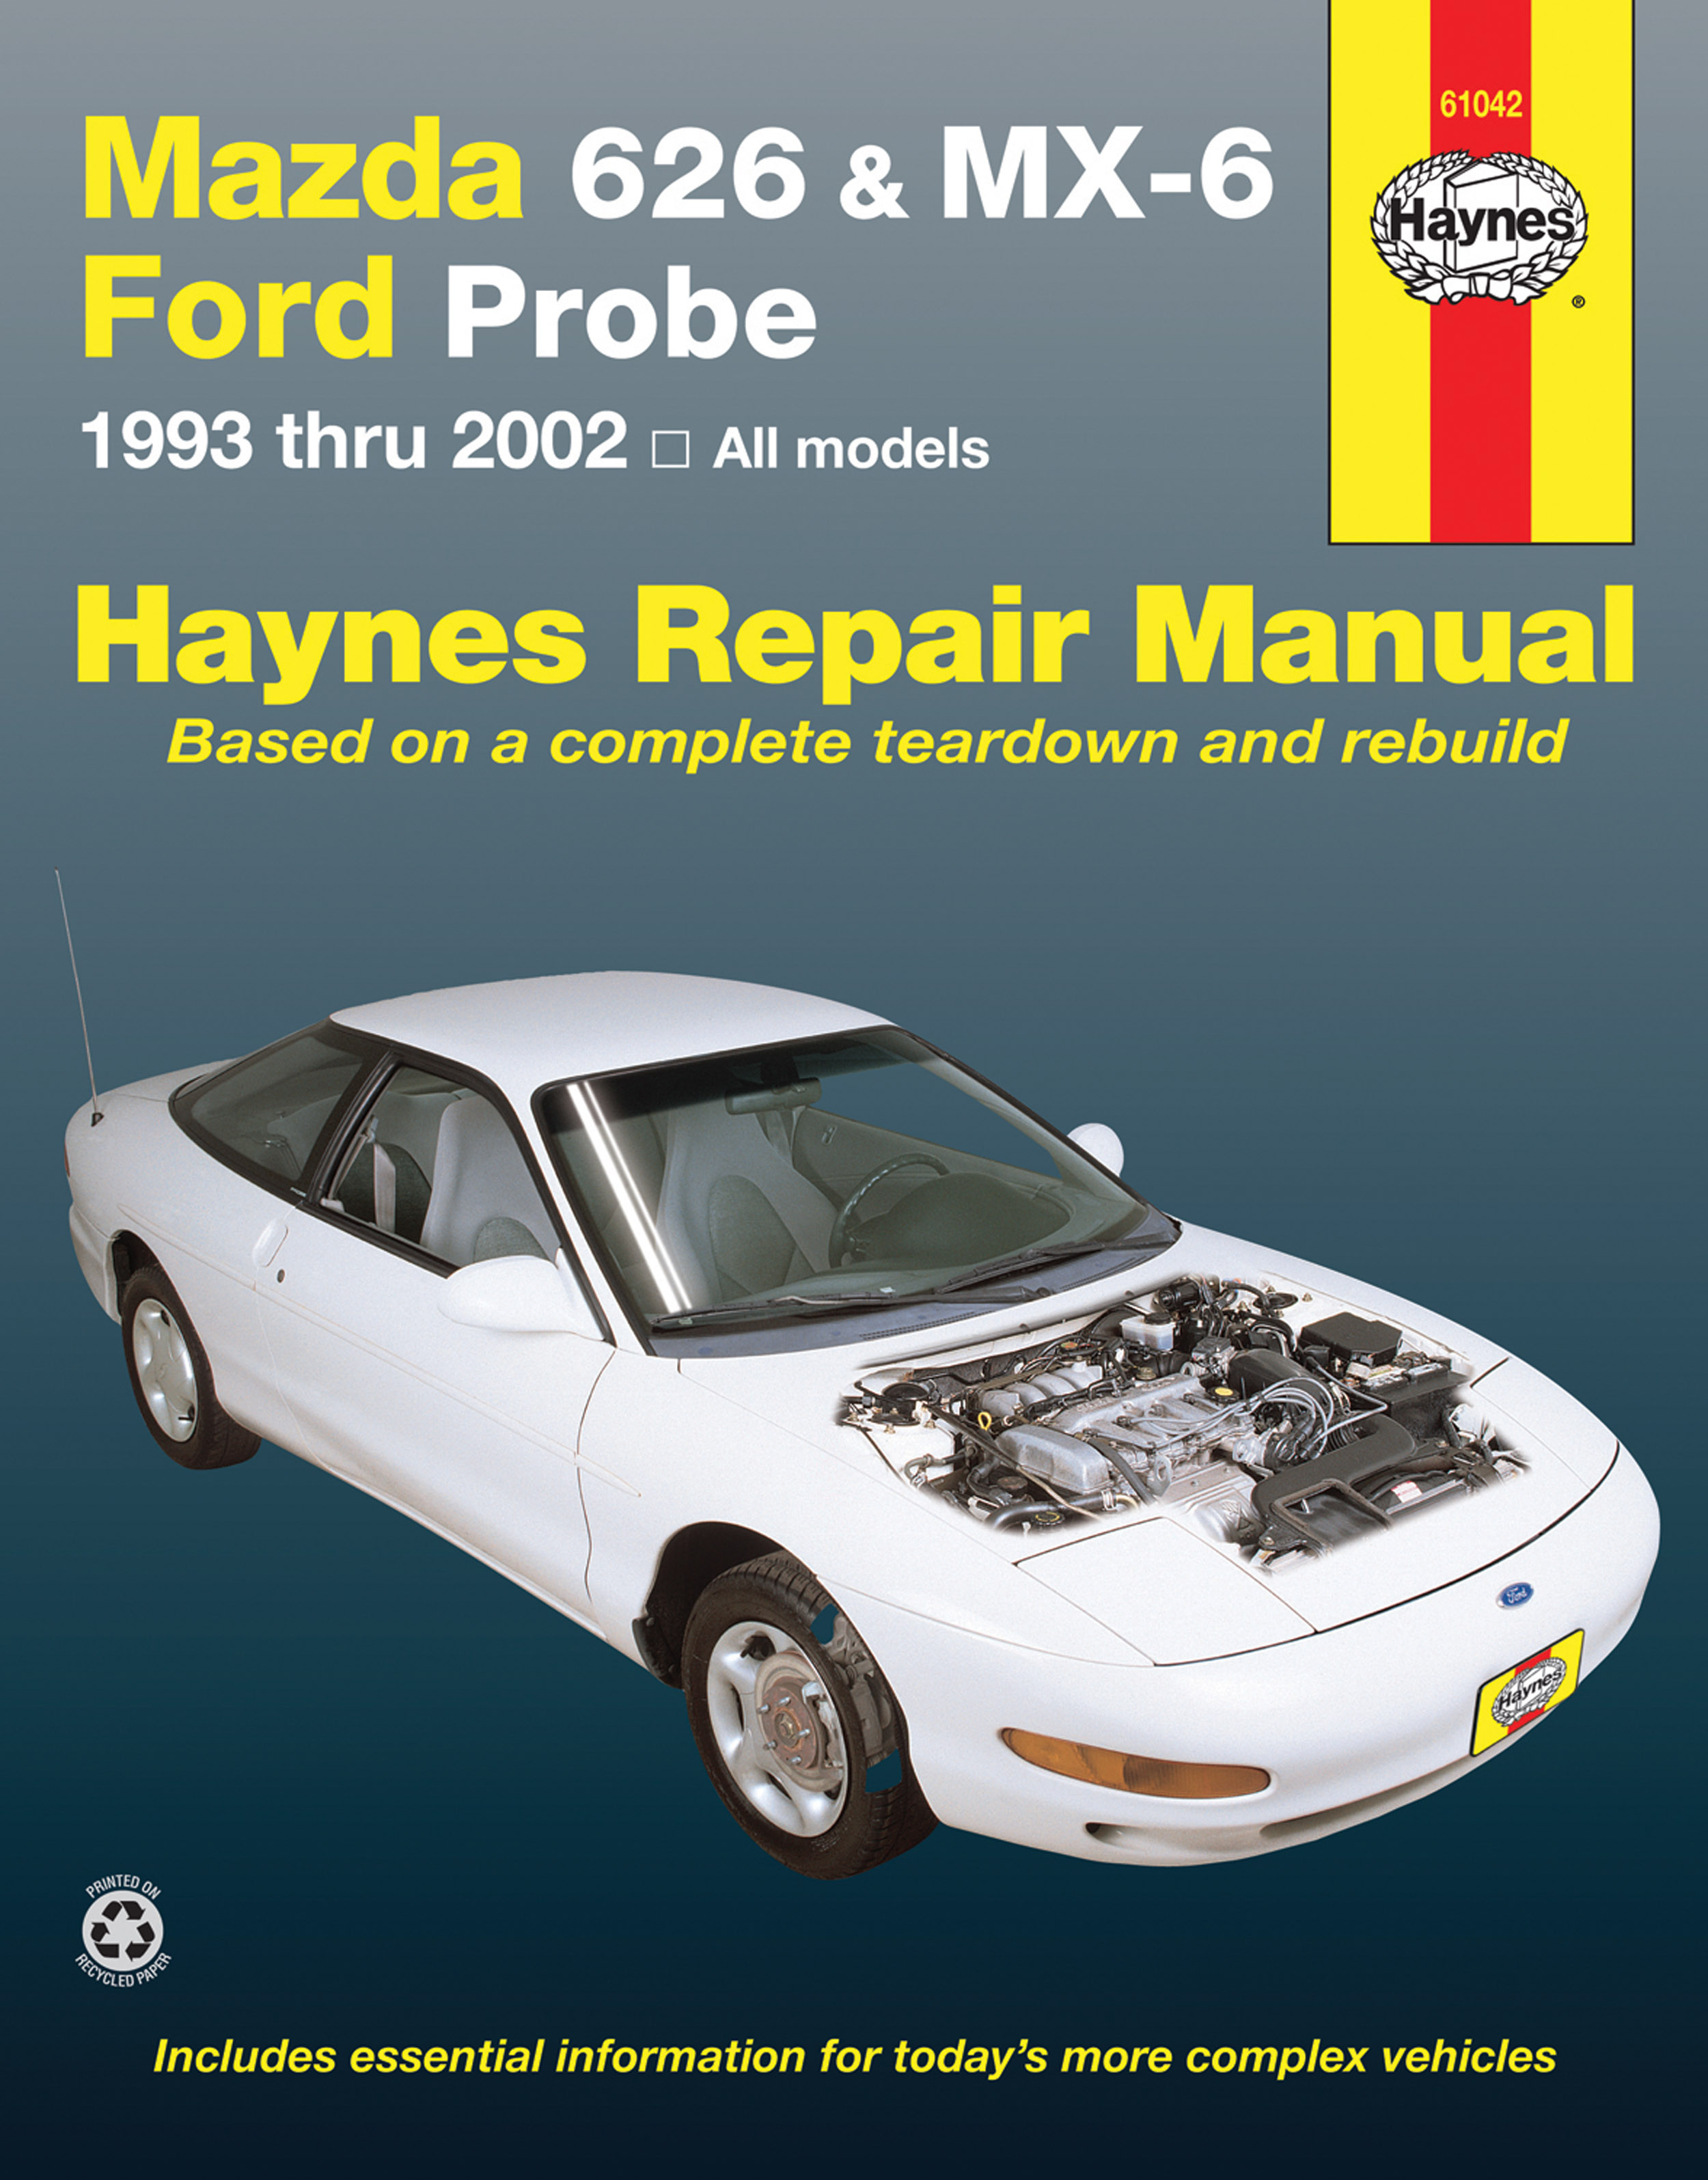 ford probe service manual pdf